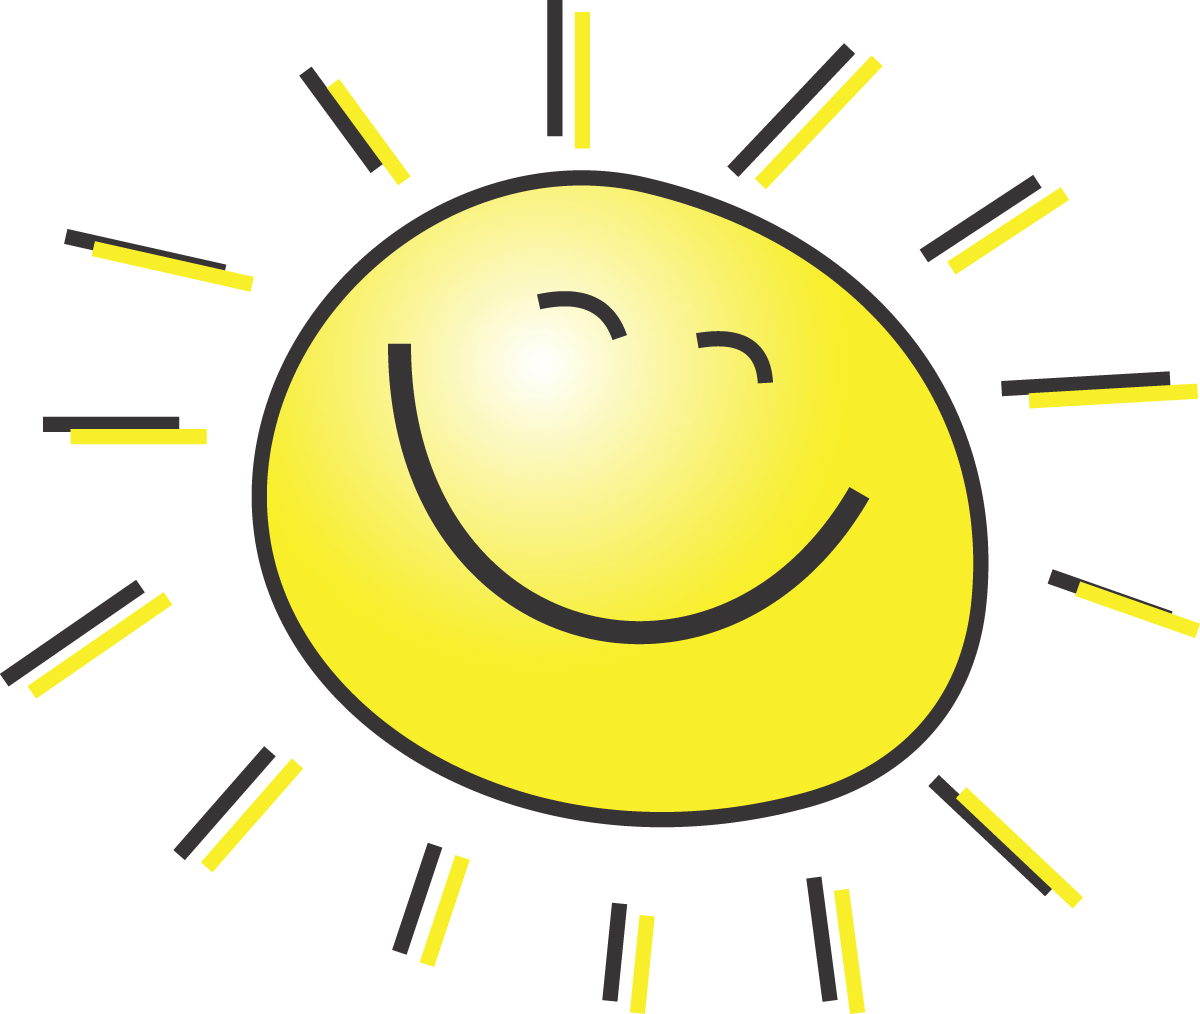 Cute Smiling Sun | Clipart library - Fre-Cute Smiling Sun | Clipart library - Free Clipart Images-16